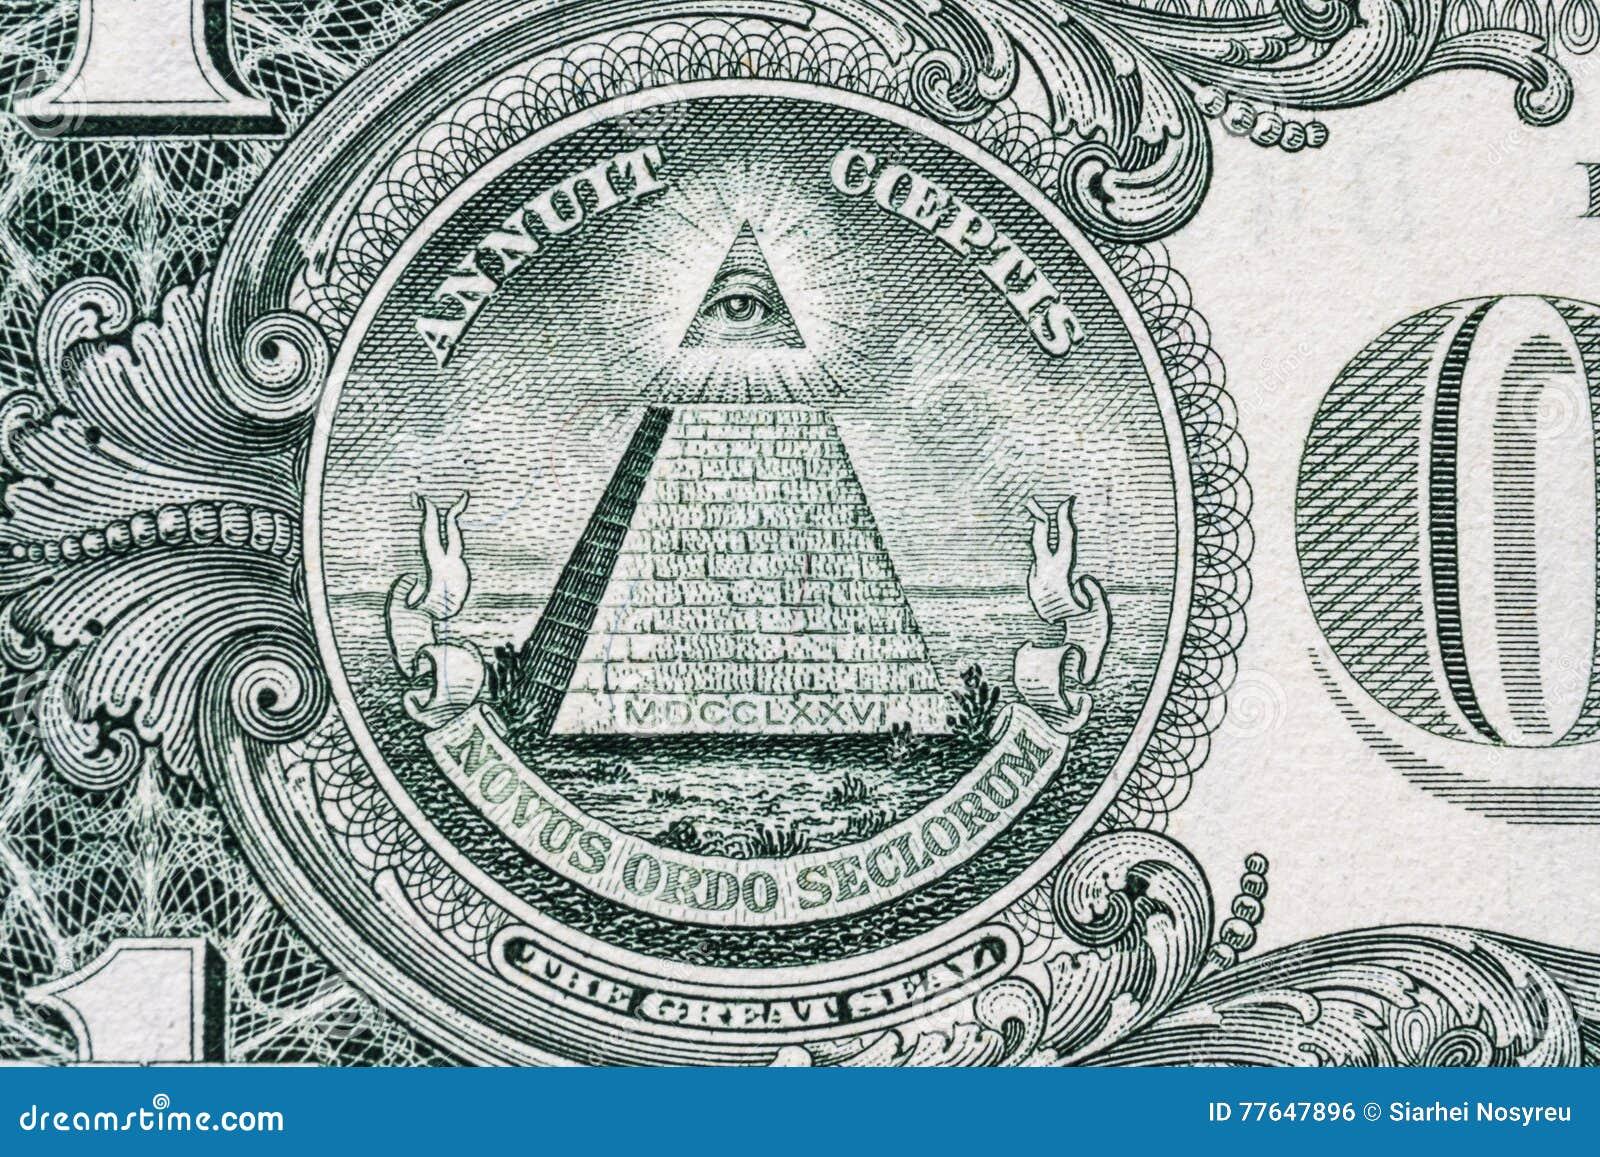 All Seeing Eye Masonic Sign Mason Symbol 1 One Dollar Stock